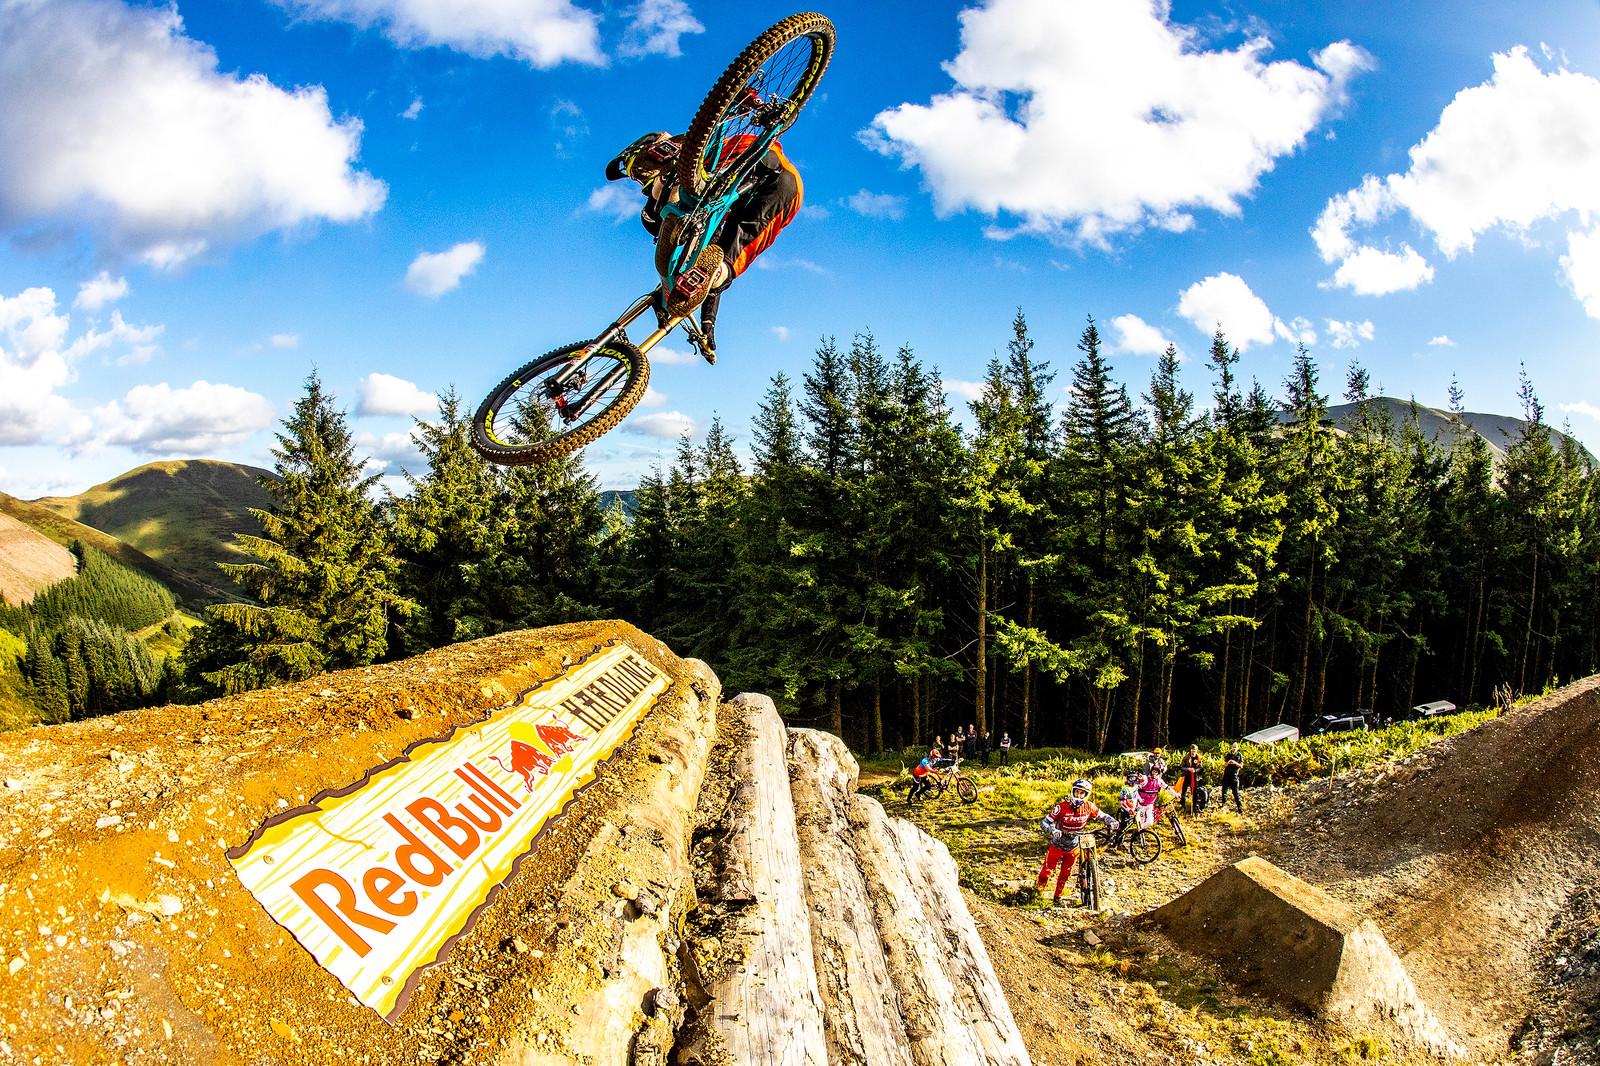 Bernie - BIG AIR PHOTO BLAST - RED BULL HARDLINE - Mountain Biking Pictures - Vital MTB